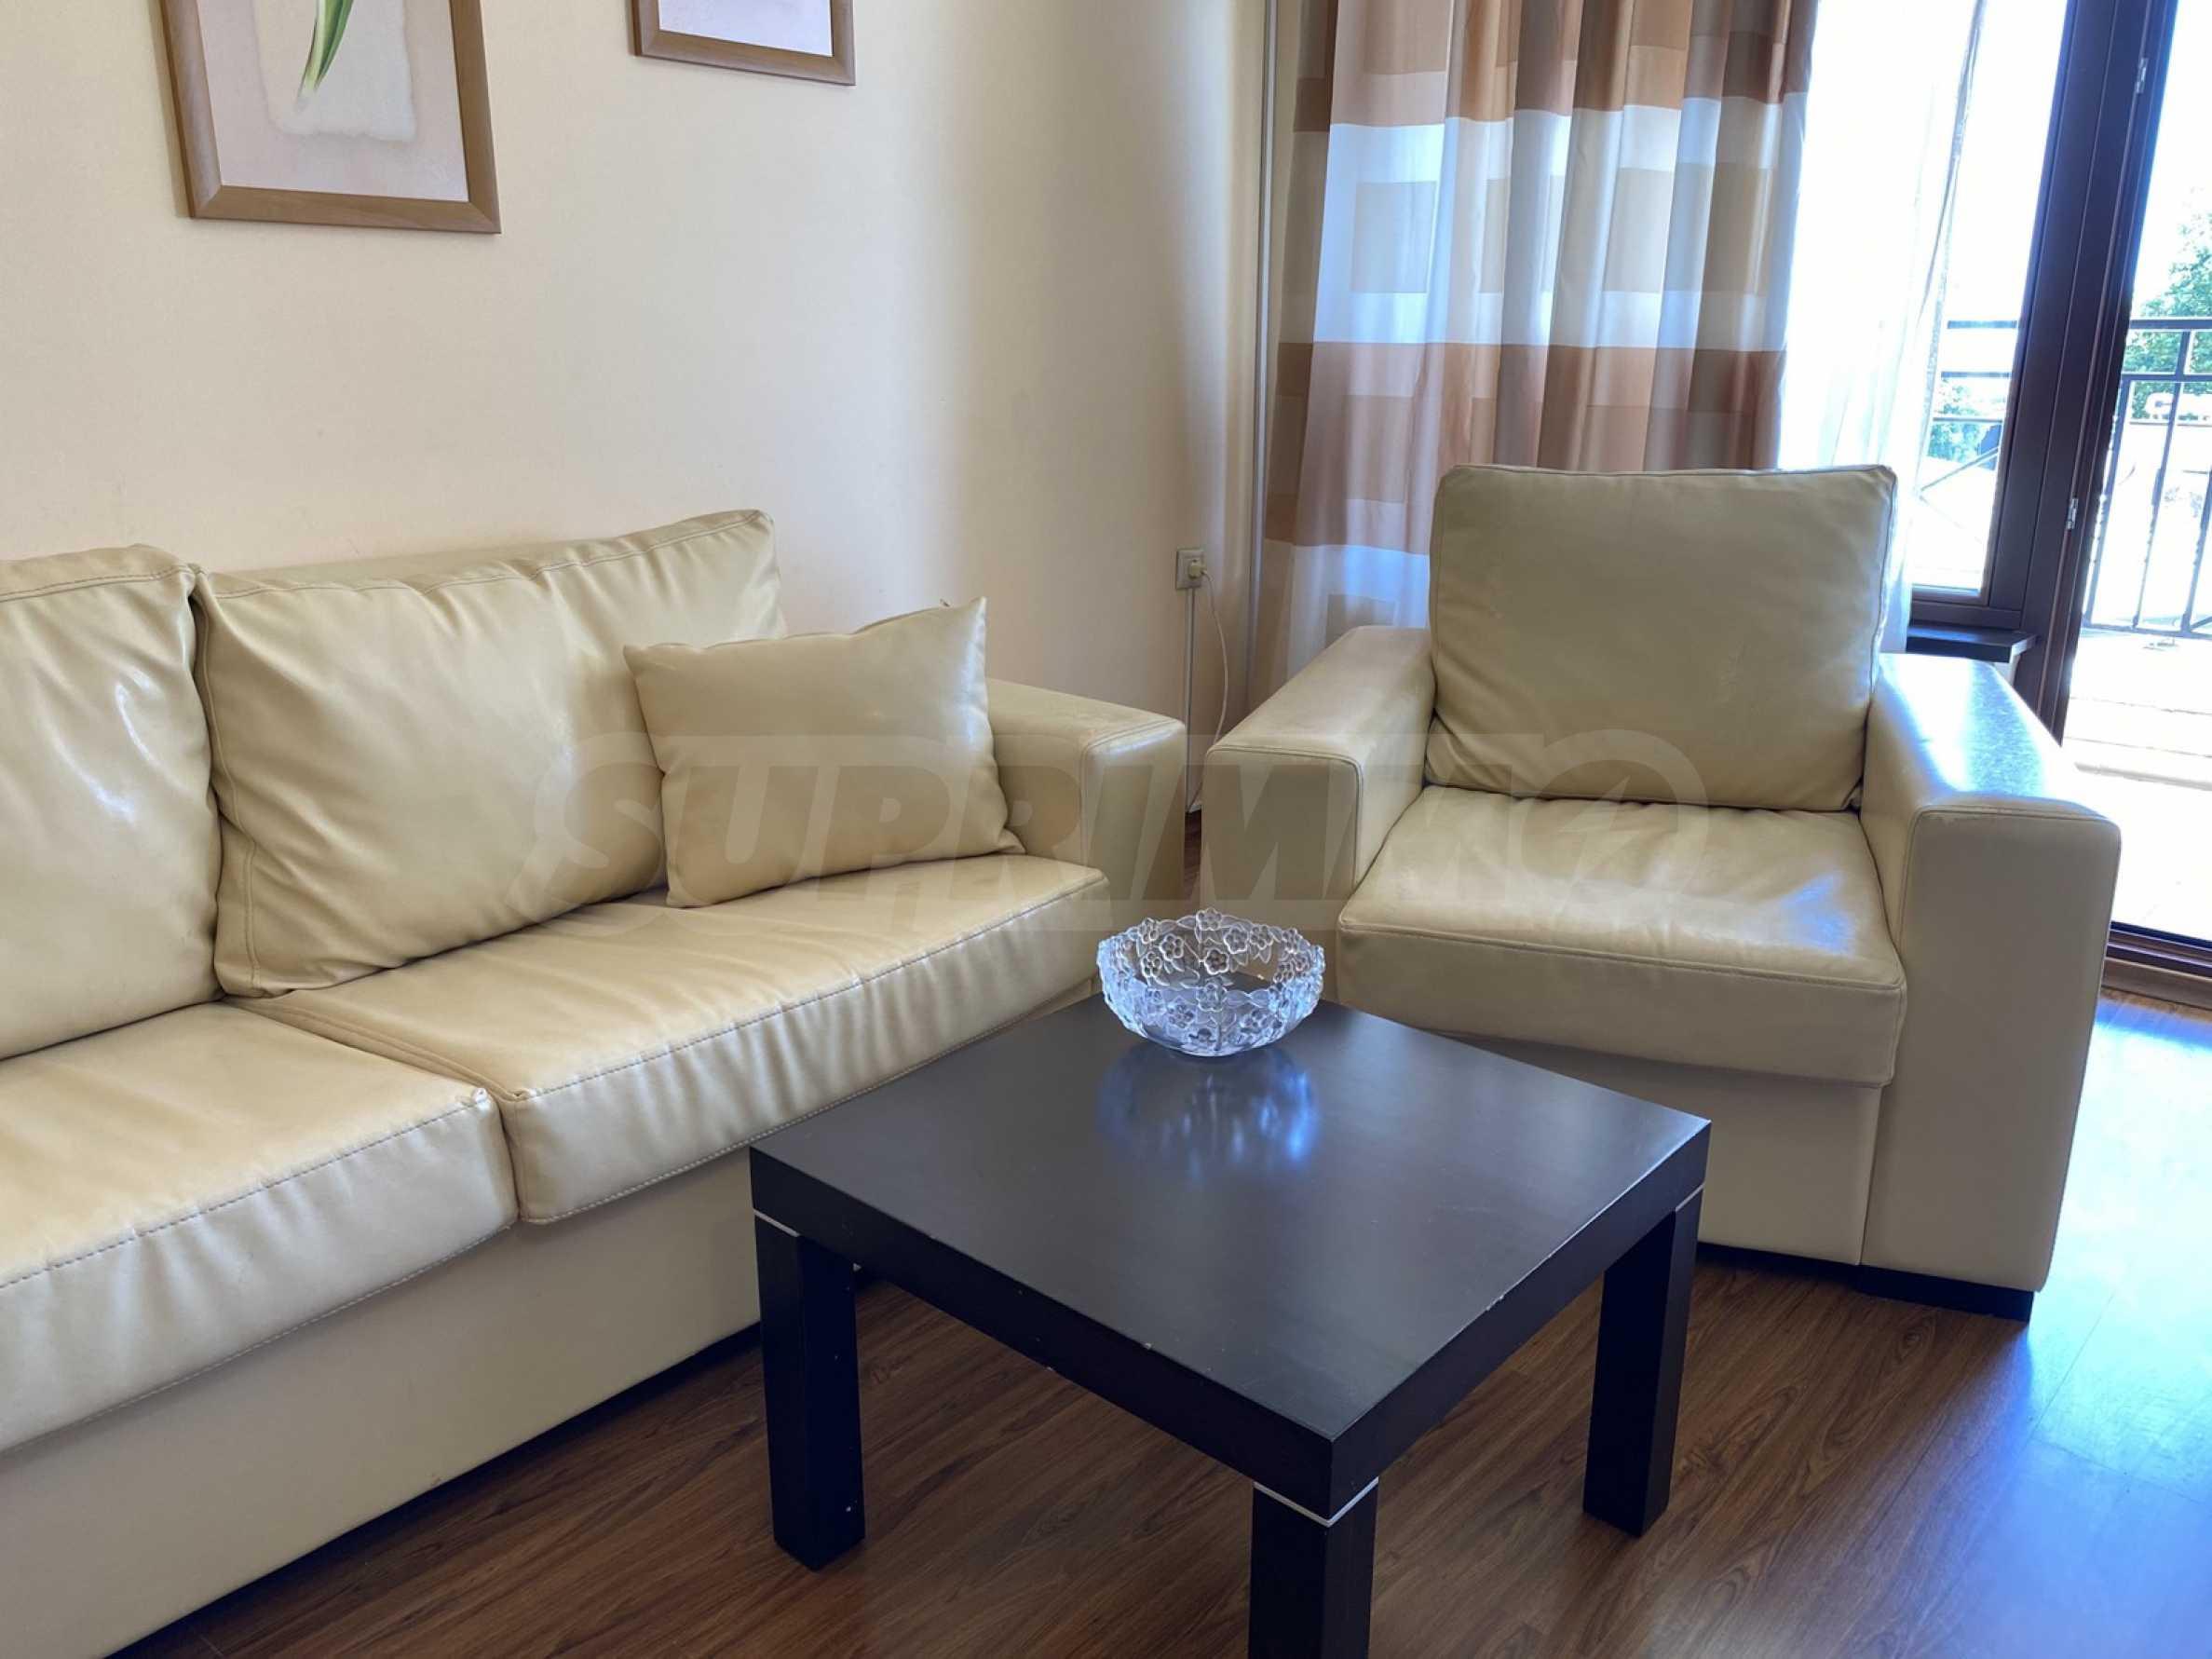 1-bedroom apartment Duralek  8